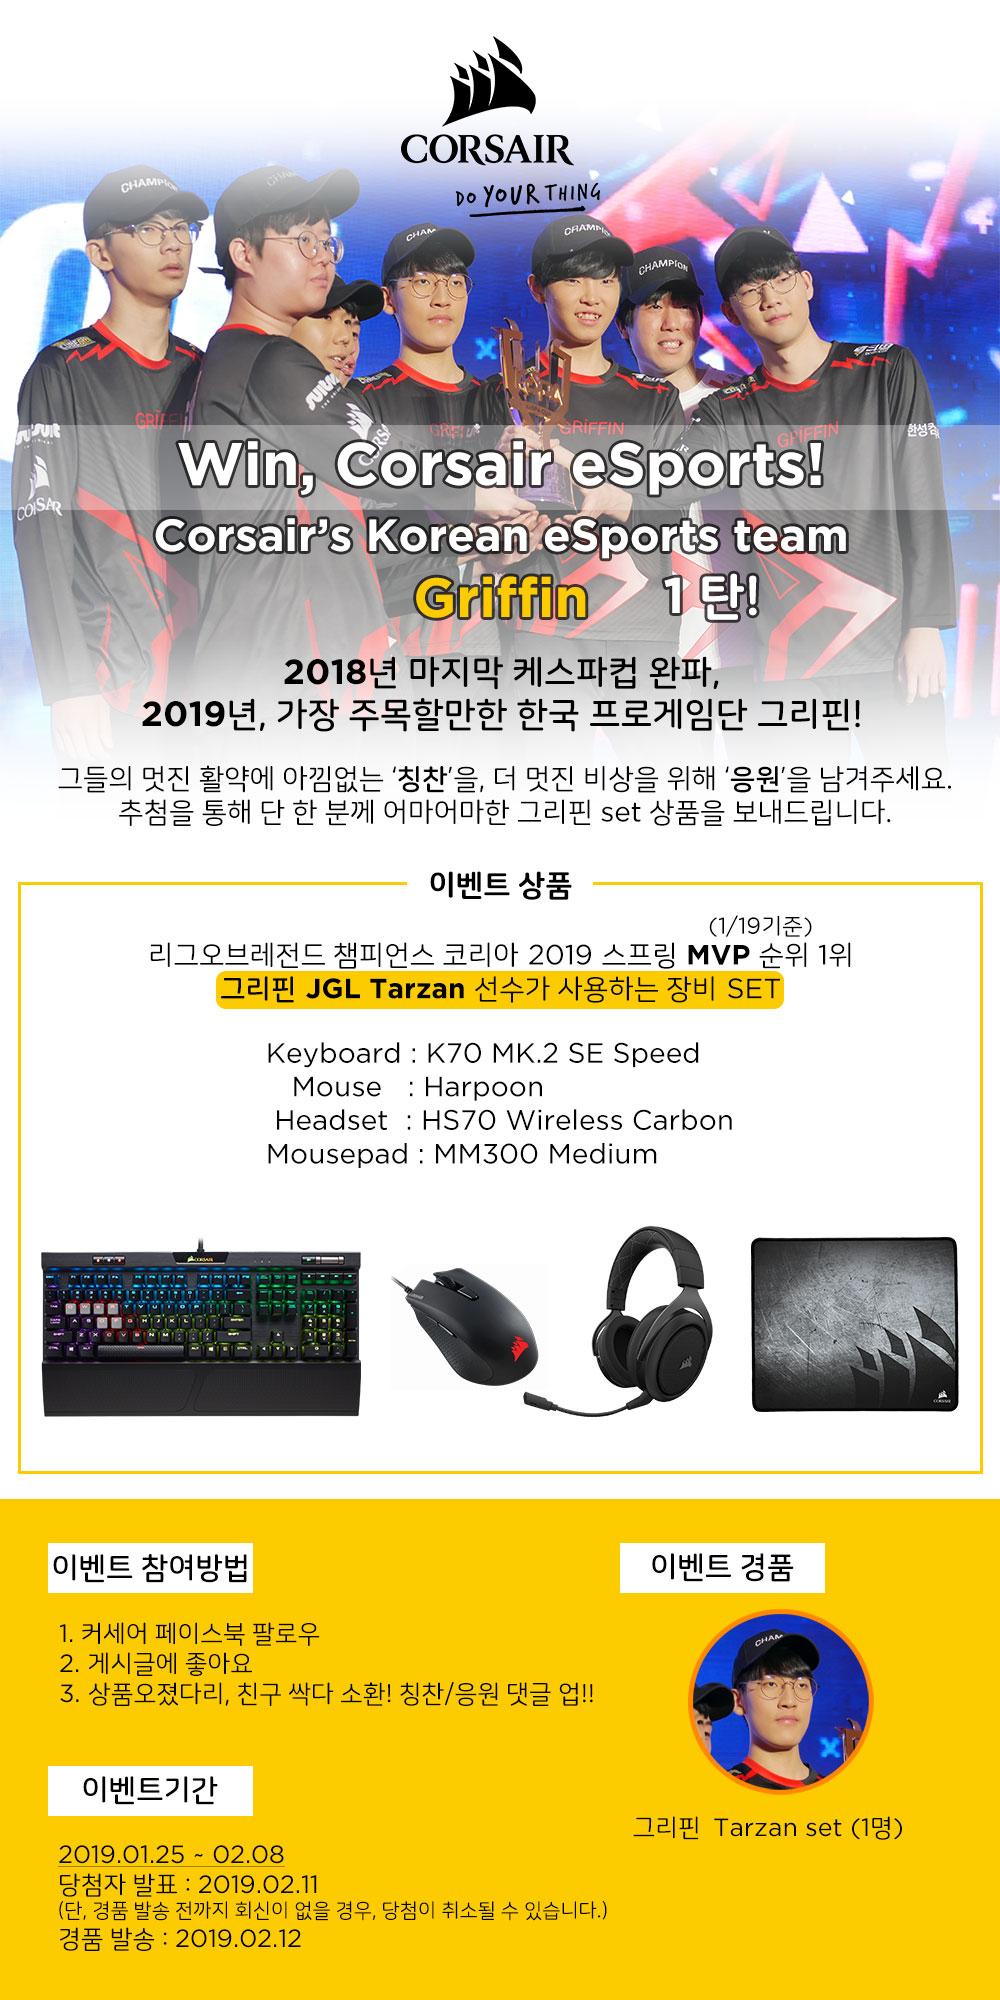 Corsair esports event (1st).jpg